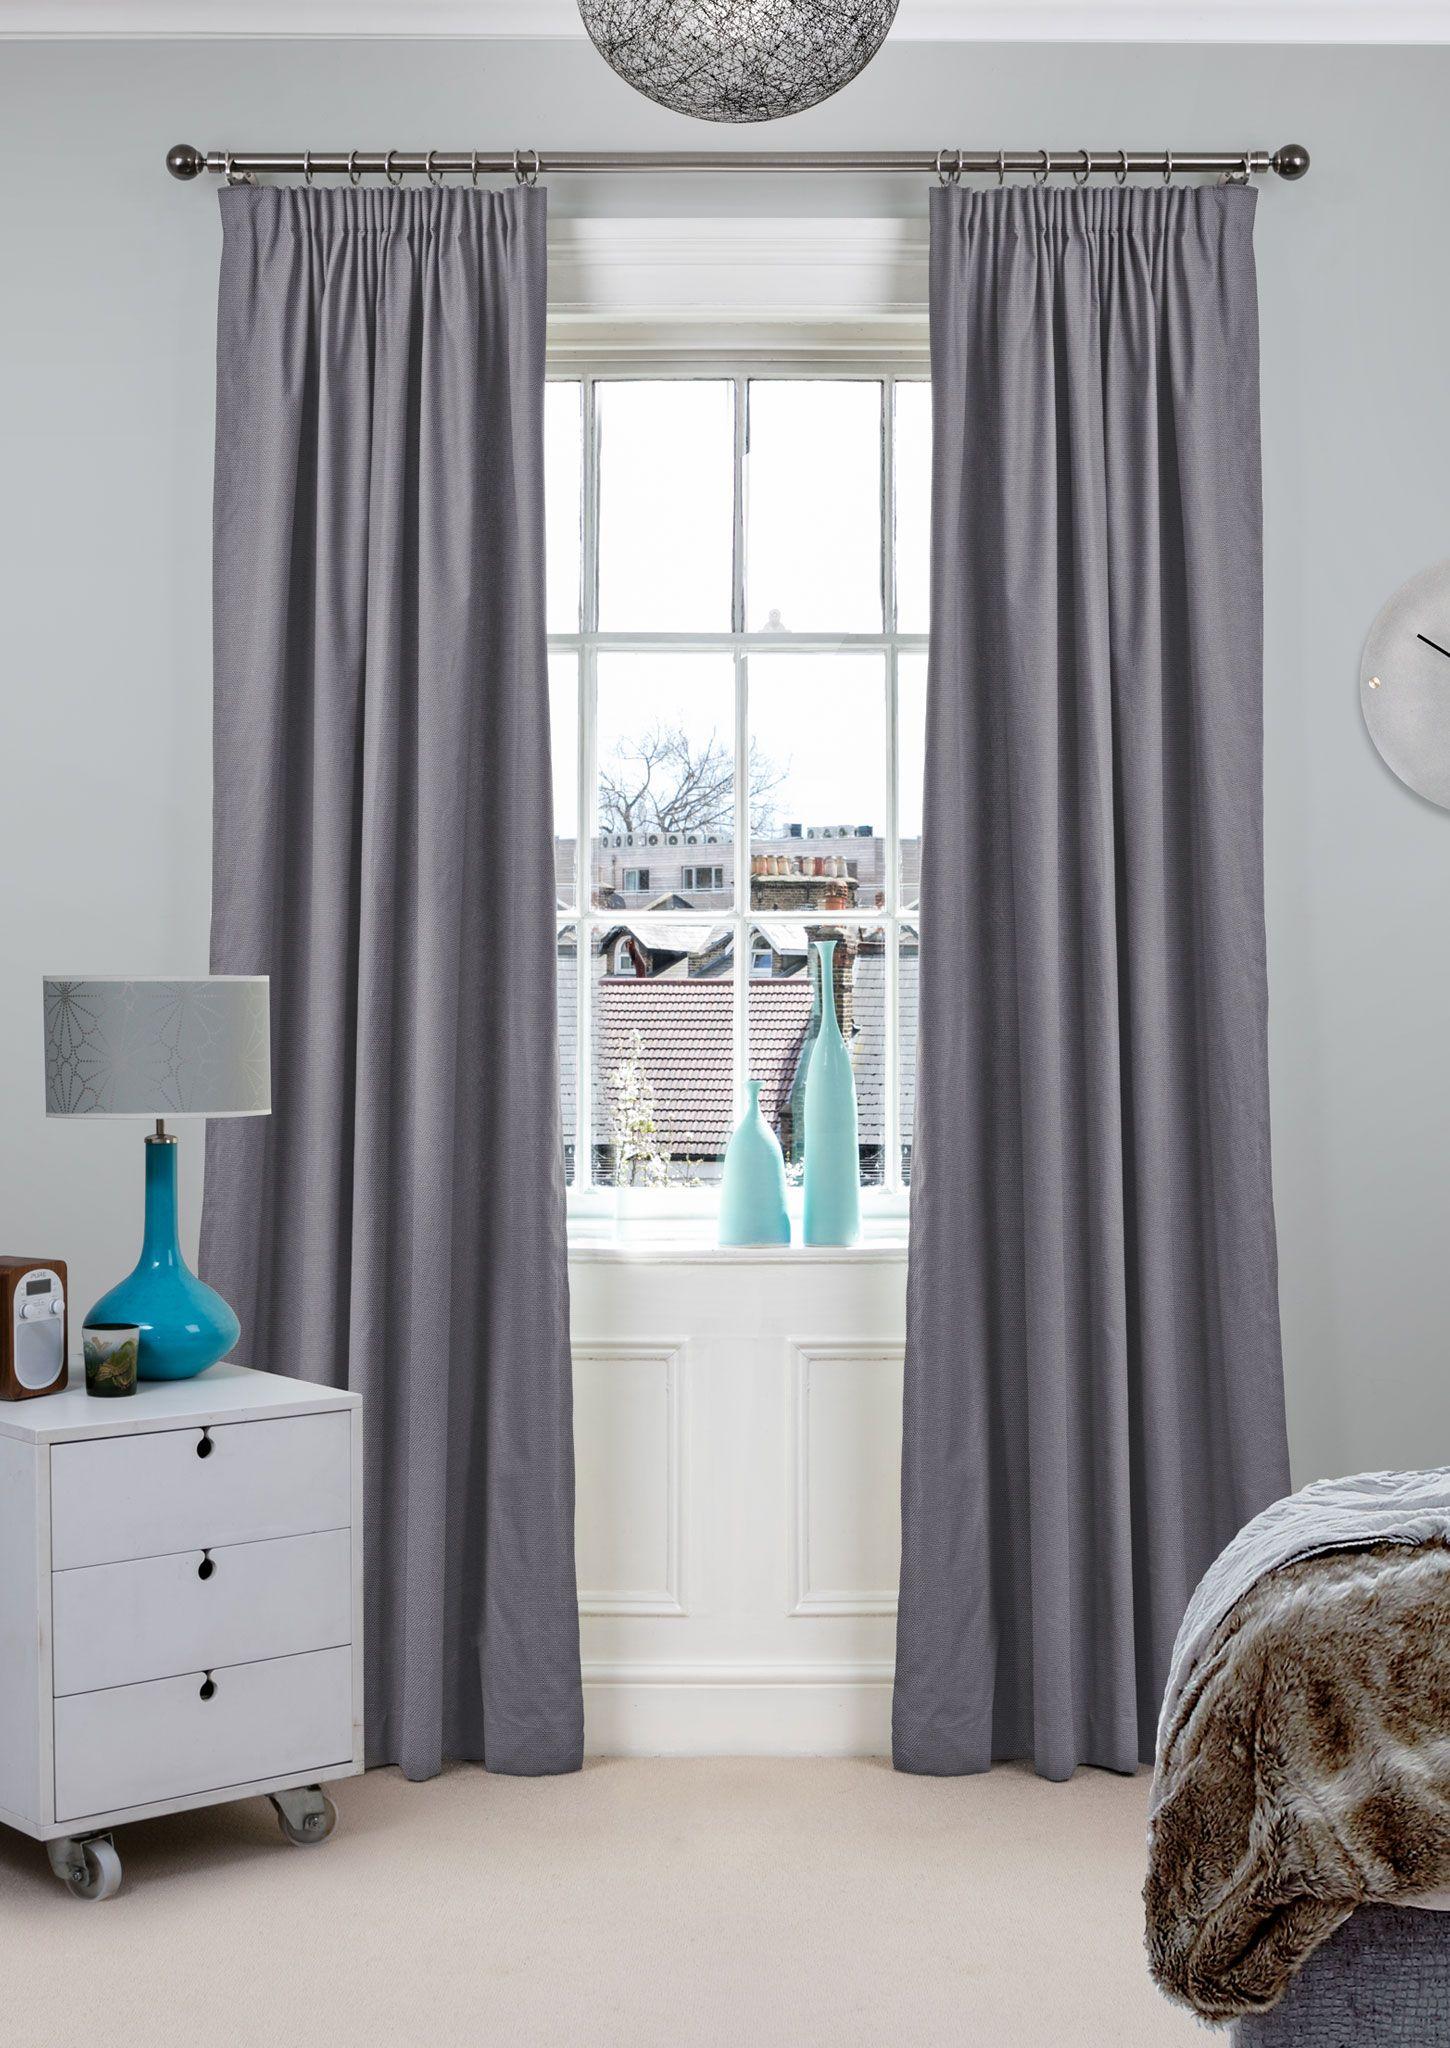 flair cinnamon - plain textured grey curtains from 100% cotton